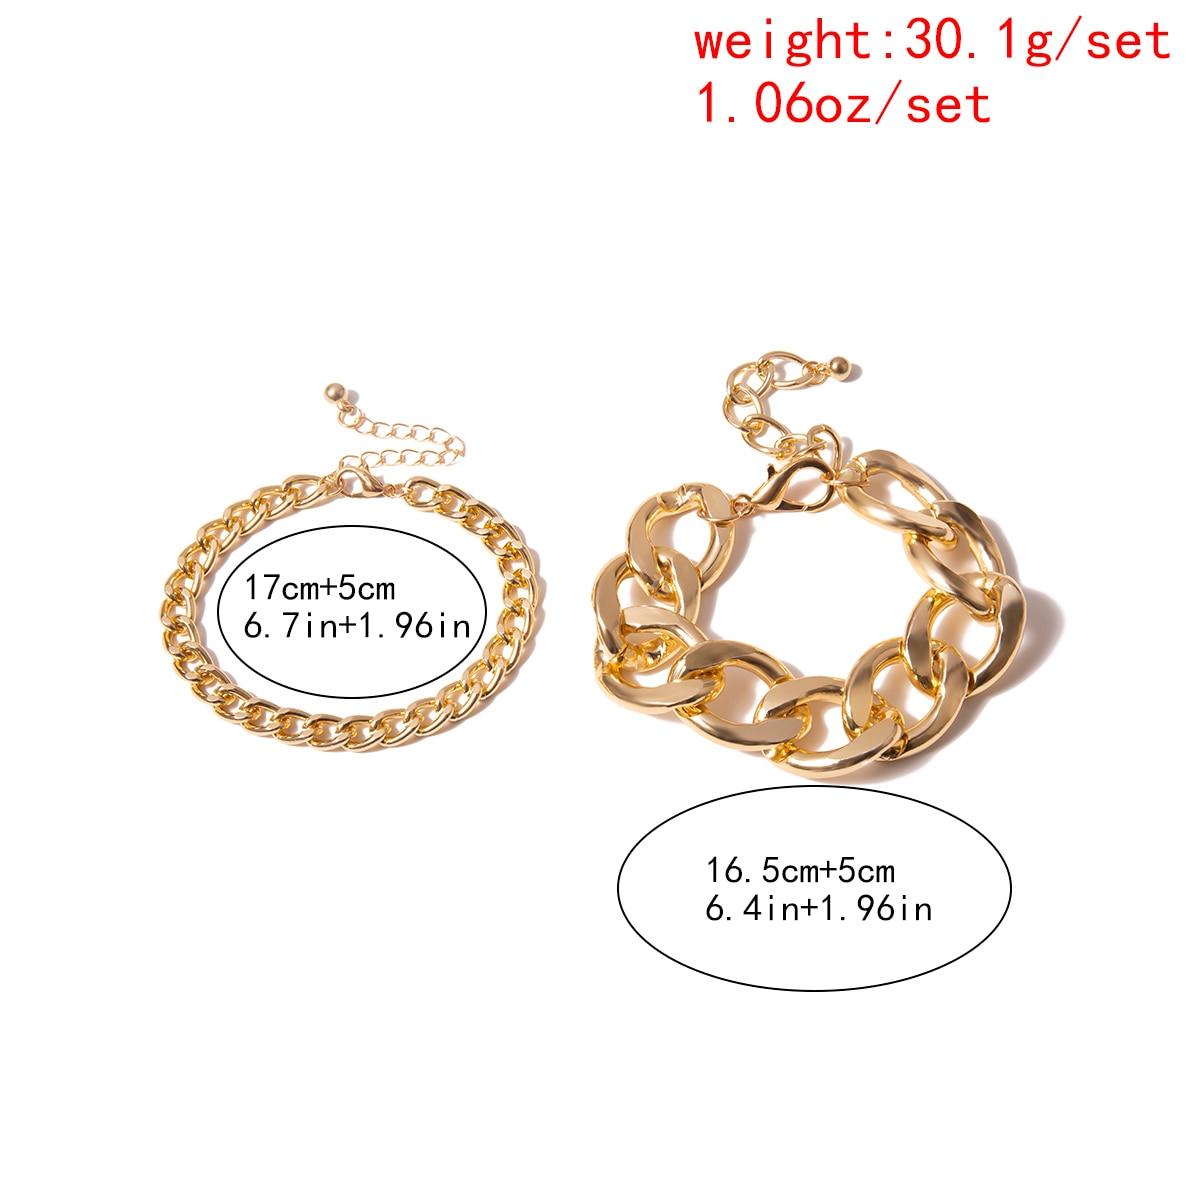 Купить с кэшбэком Ingemark 2 Pcs/Set Snake Lock Chain Bracelets Bangles Armband Femme Accesory Mujer Punk Thick Chain Bracelet Couple Jewelry 2019